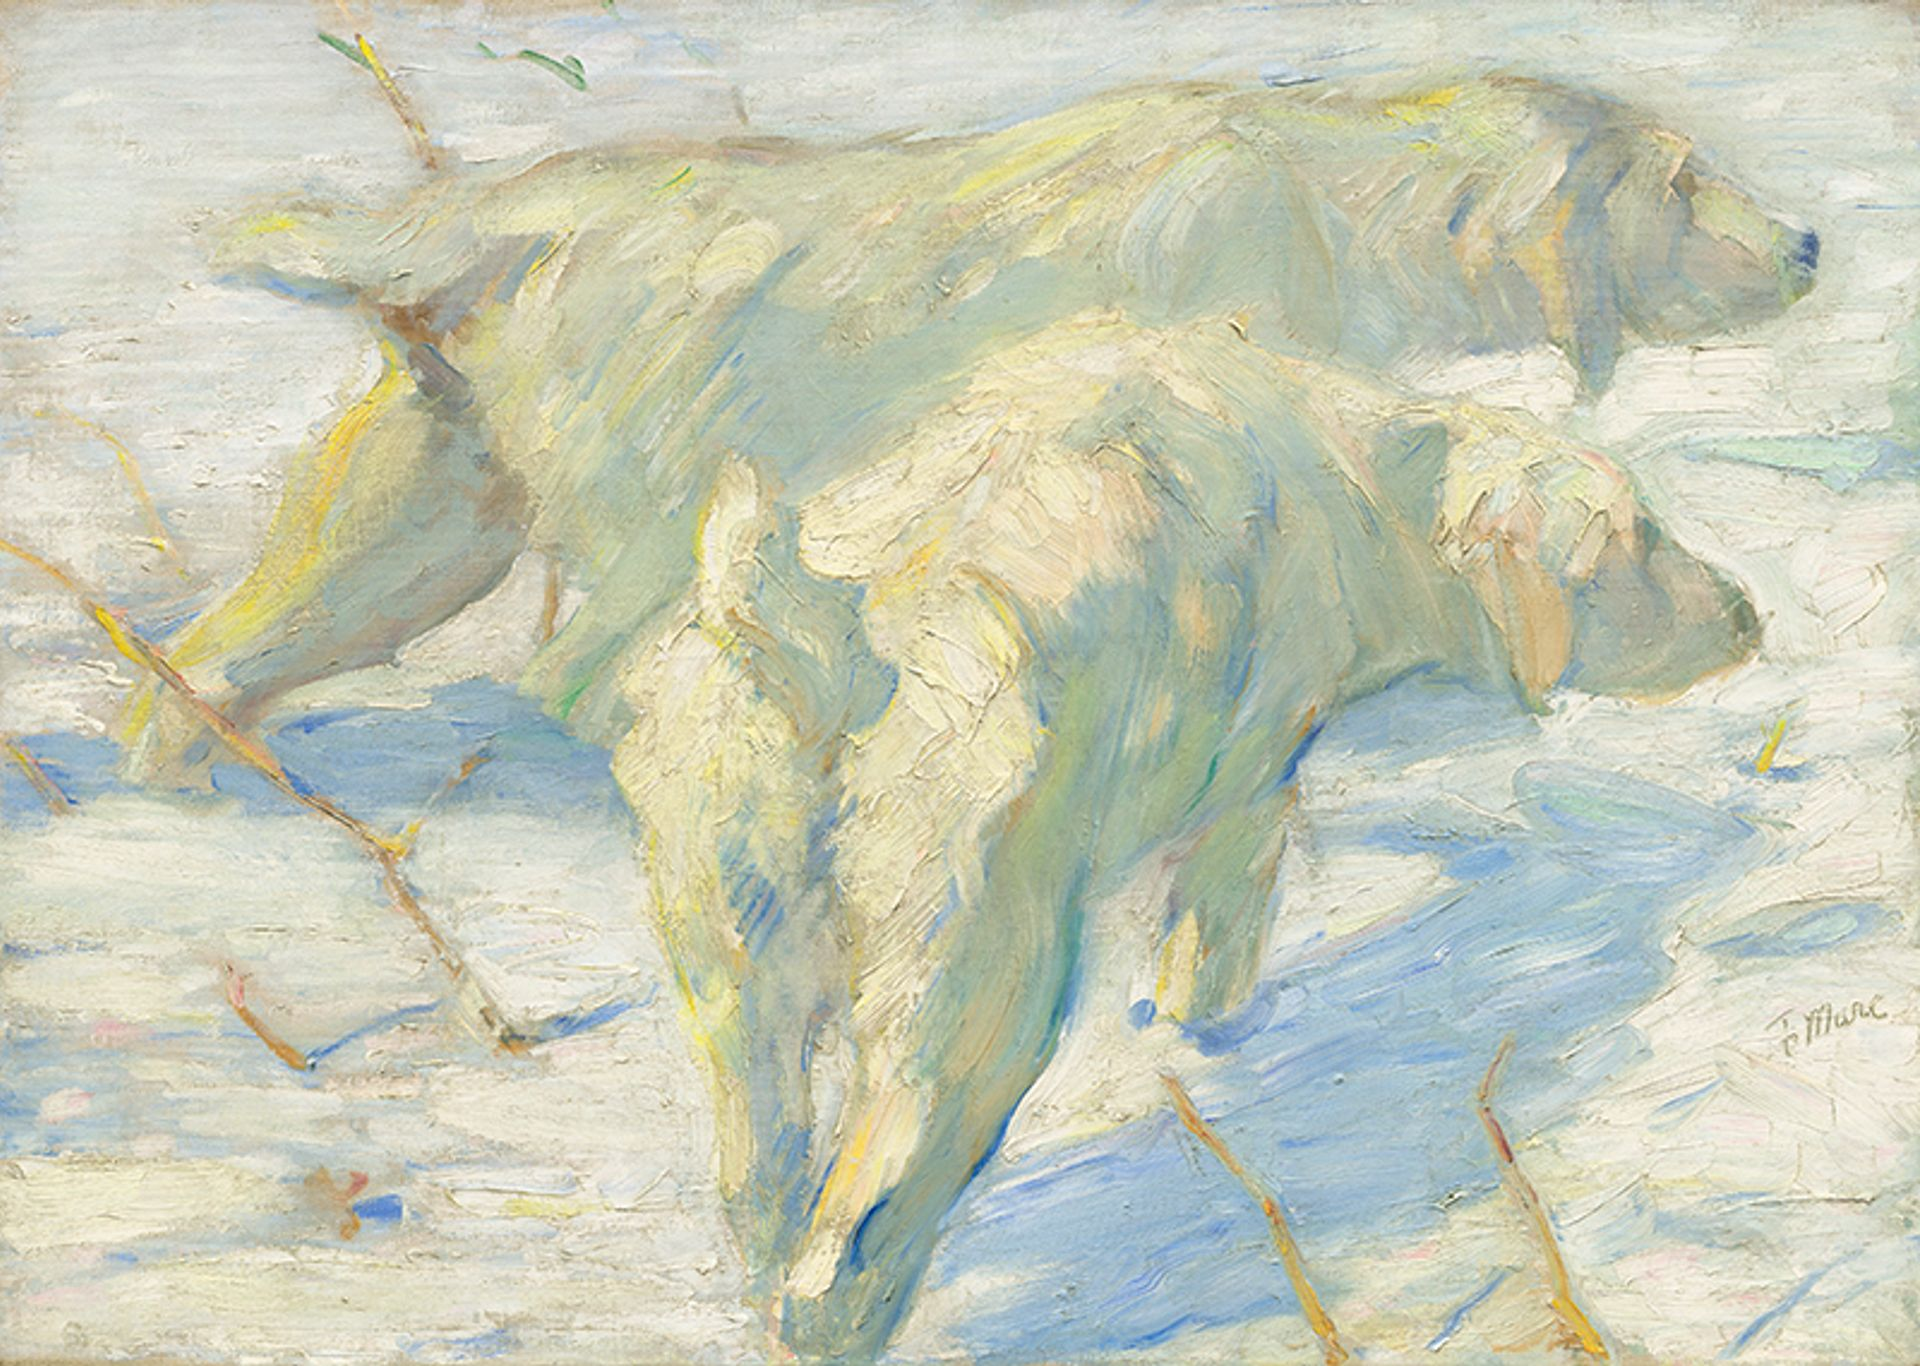 Franz Marc, Siberian Sheepdogs (1909) National Gallery of Art, Washington